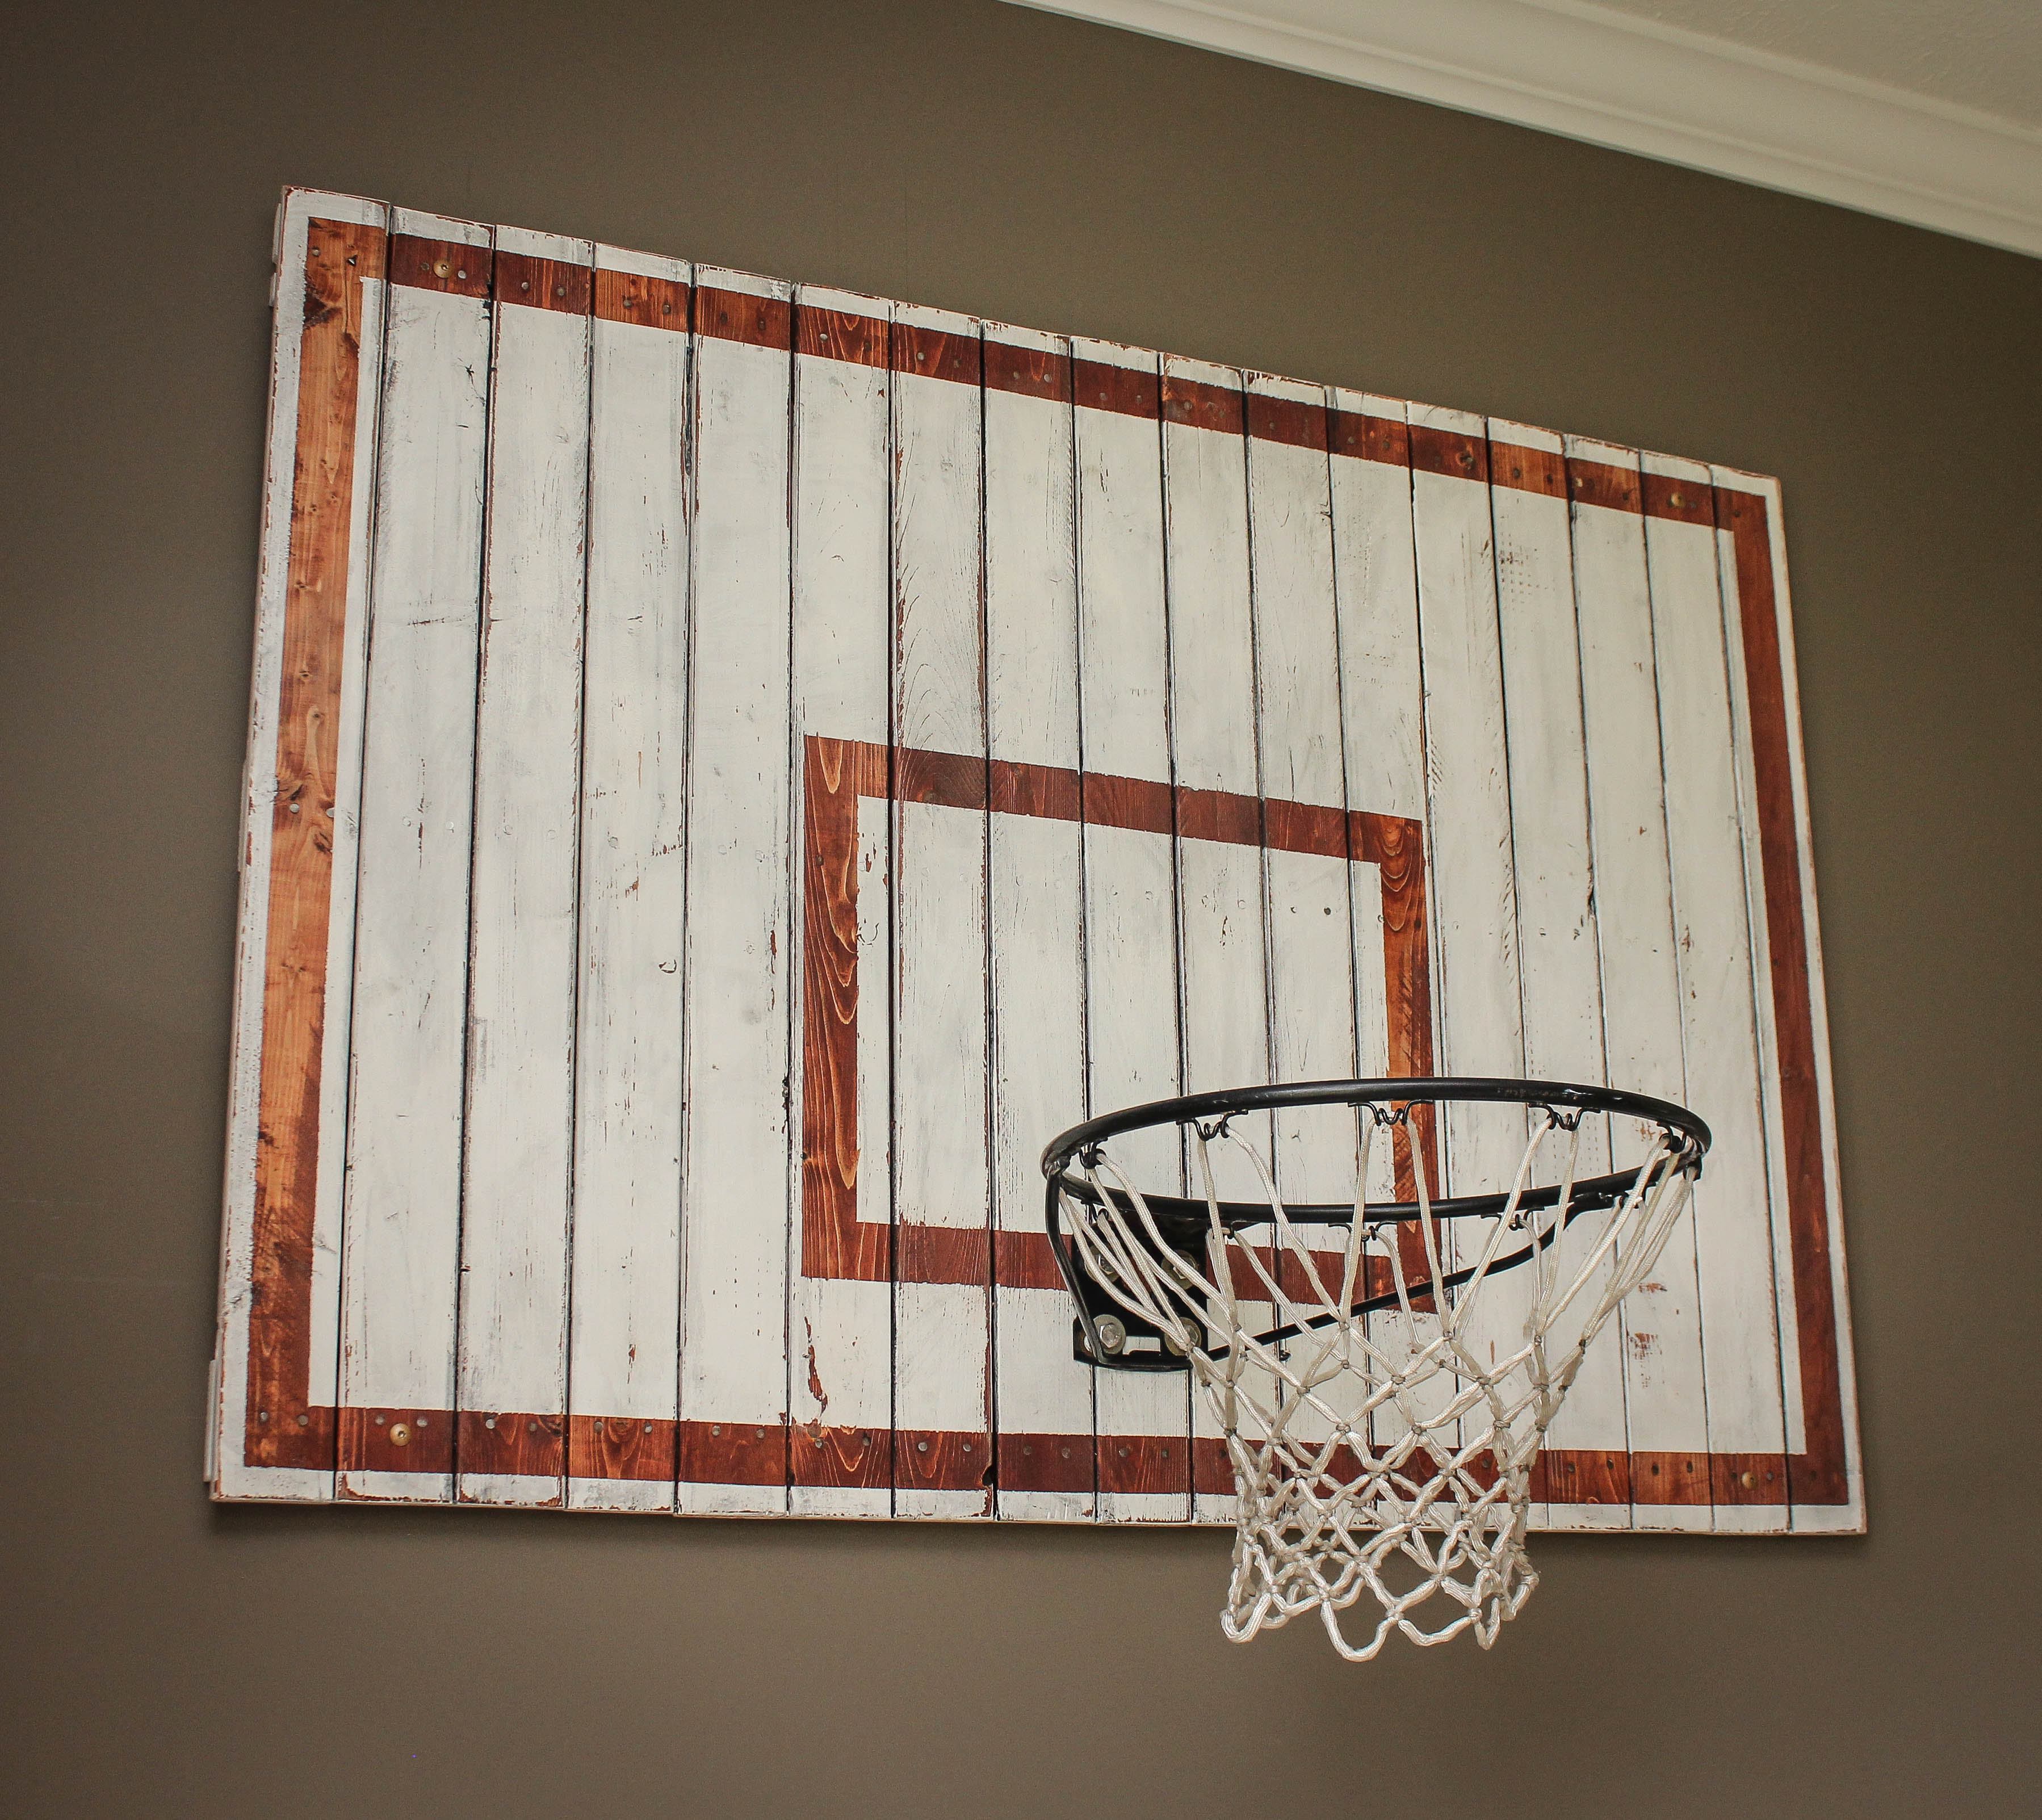 Indoor Basketball Hoop | RUGGY DIY